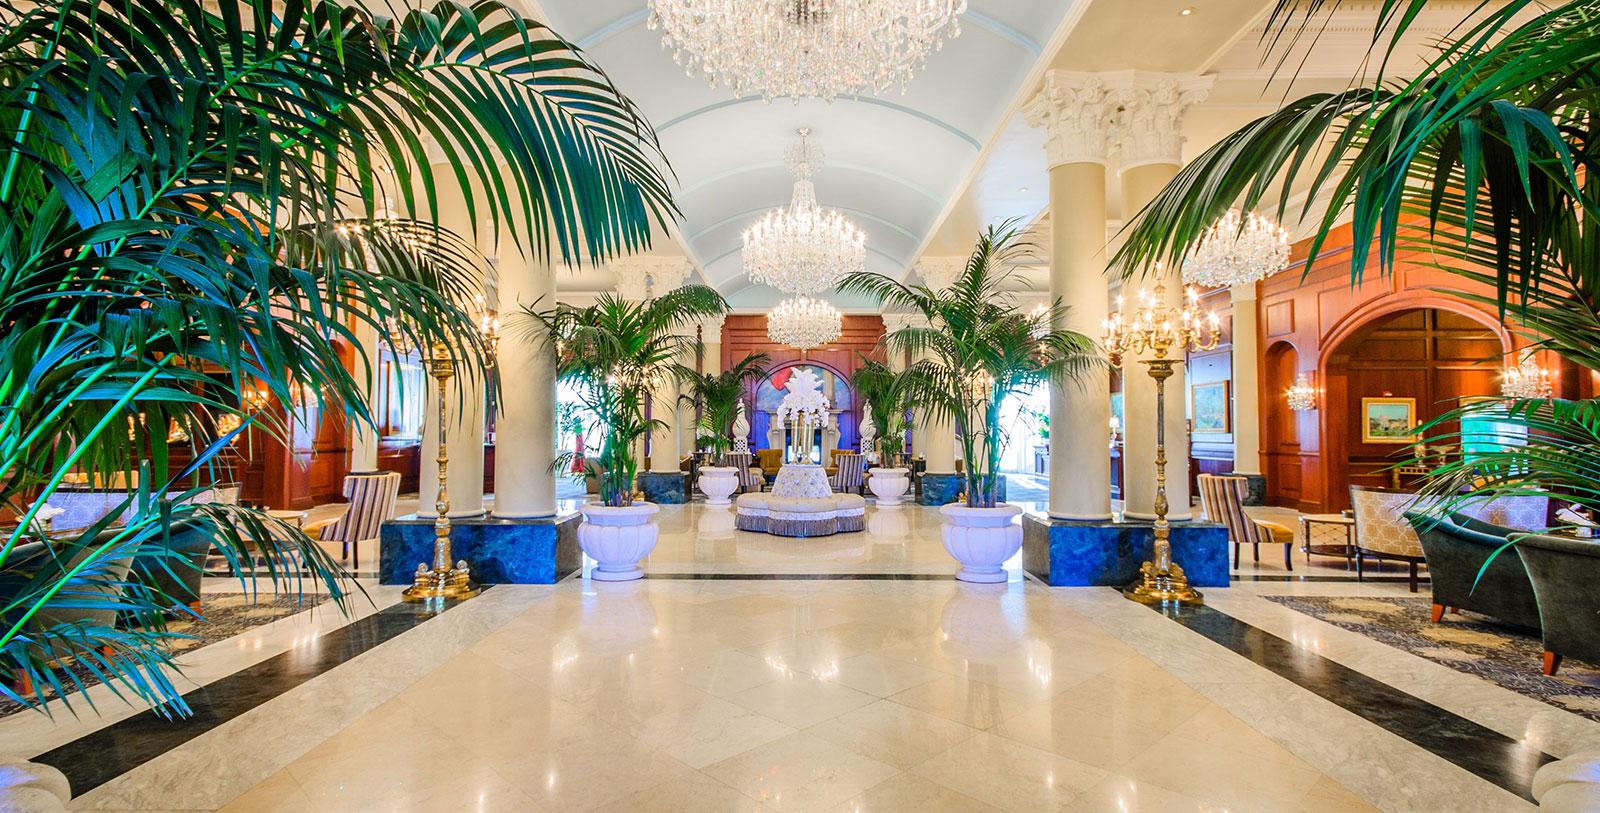 Image of Hotel Lobby, the Lodge at Nemacolin Woodlands Resort, 1968, Member of Historic Hotels of America, Farmington, Pennsylvania